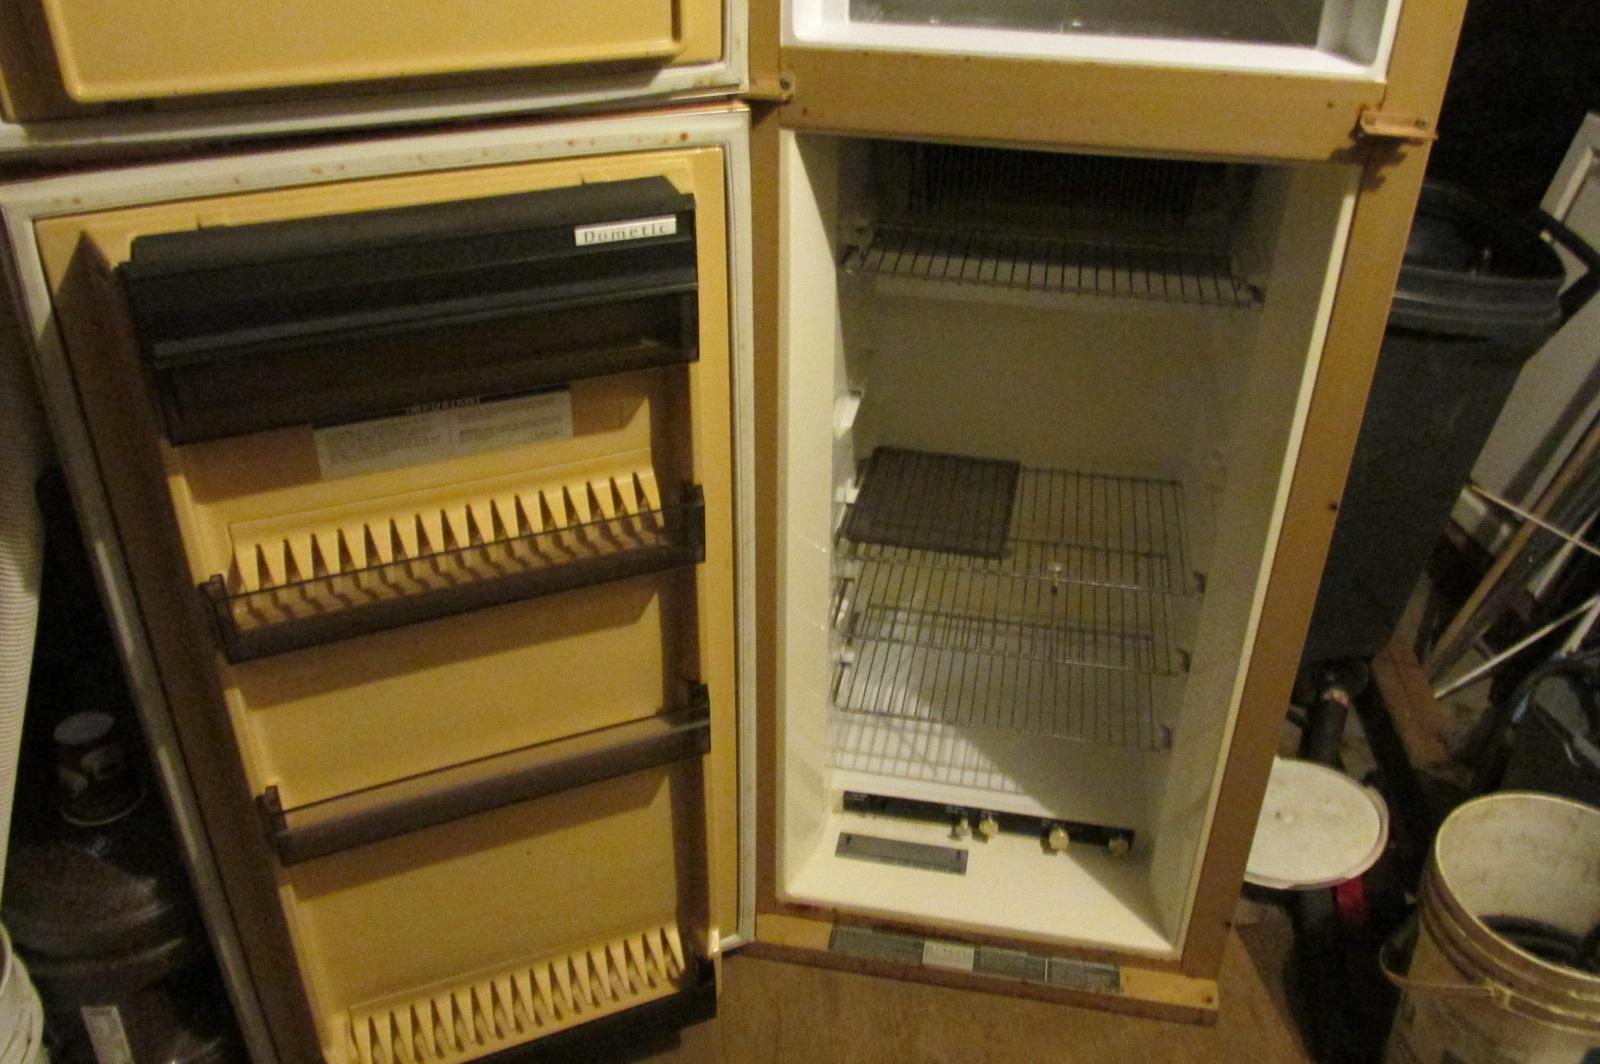 dometic gas and elc fridge for sale 57u201d h x 24u201d w x 25 u201dd dometic royal